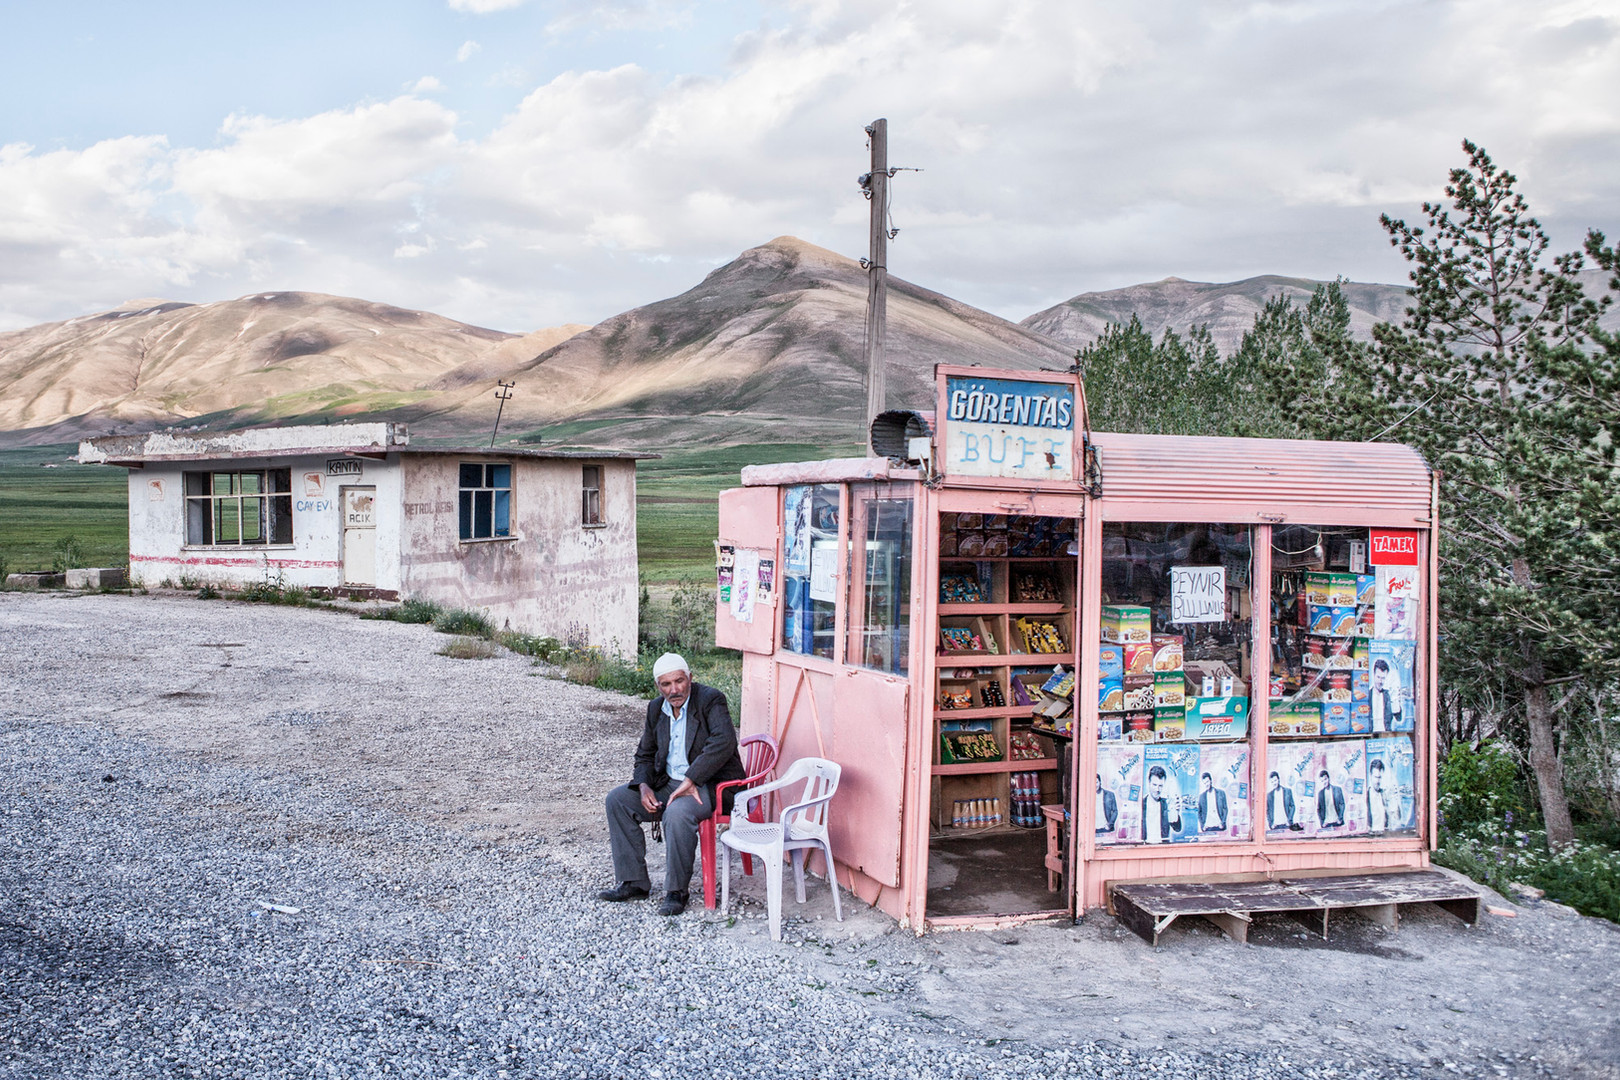 A village grocery. Gorentas, Van. June 2012.